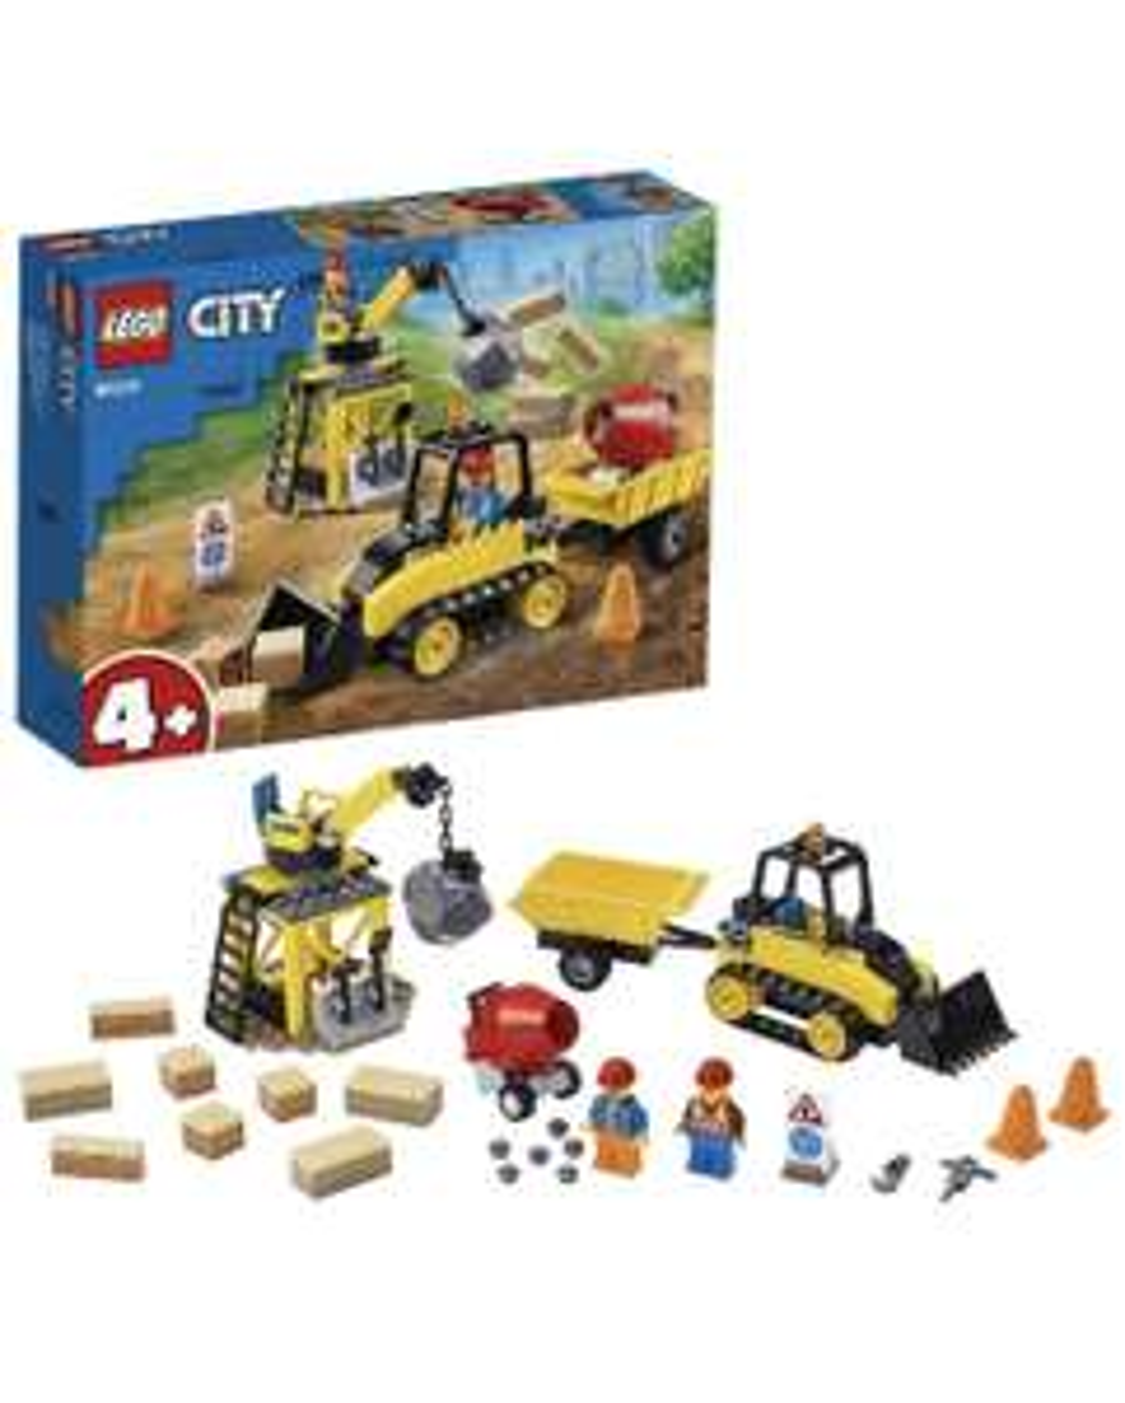 LEGO 60252 City Construction Bulldozer Toy with Starter Brick and Crane £12 (Prime) / £16.49 (non Prime) at Amazon